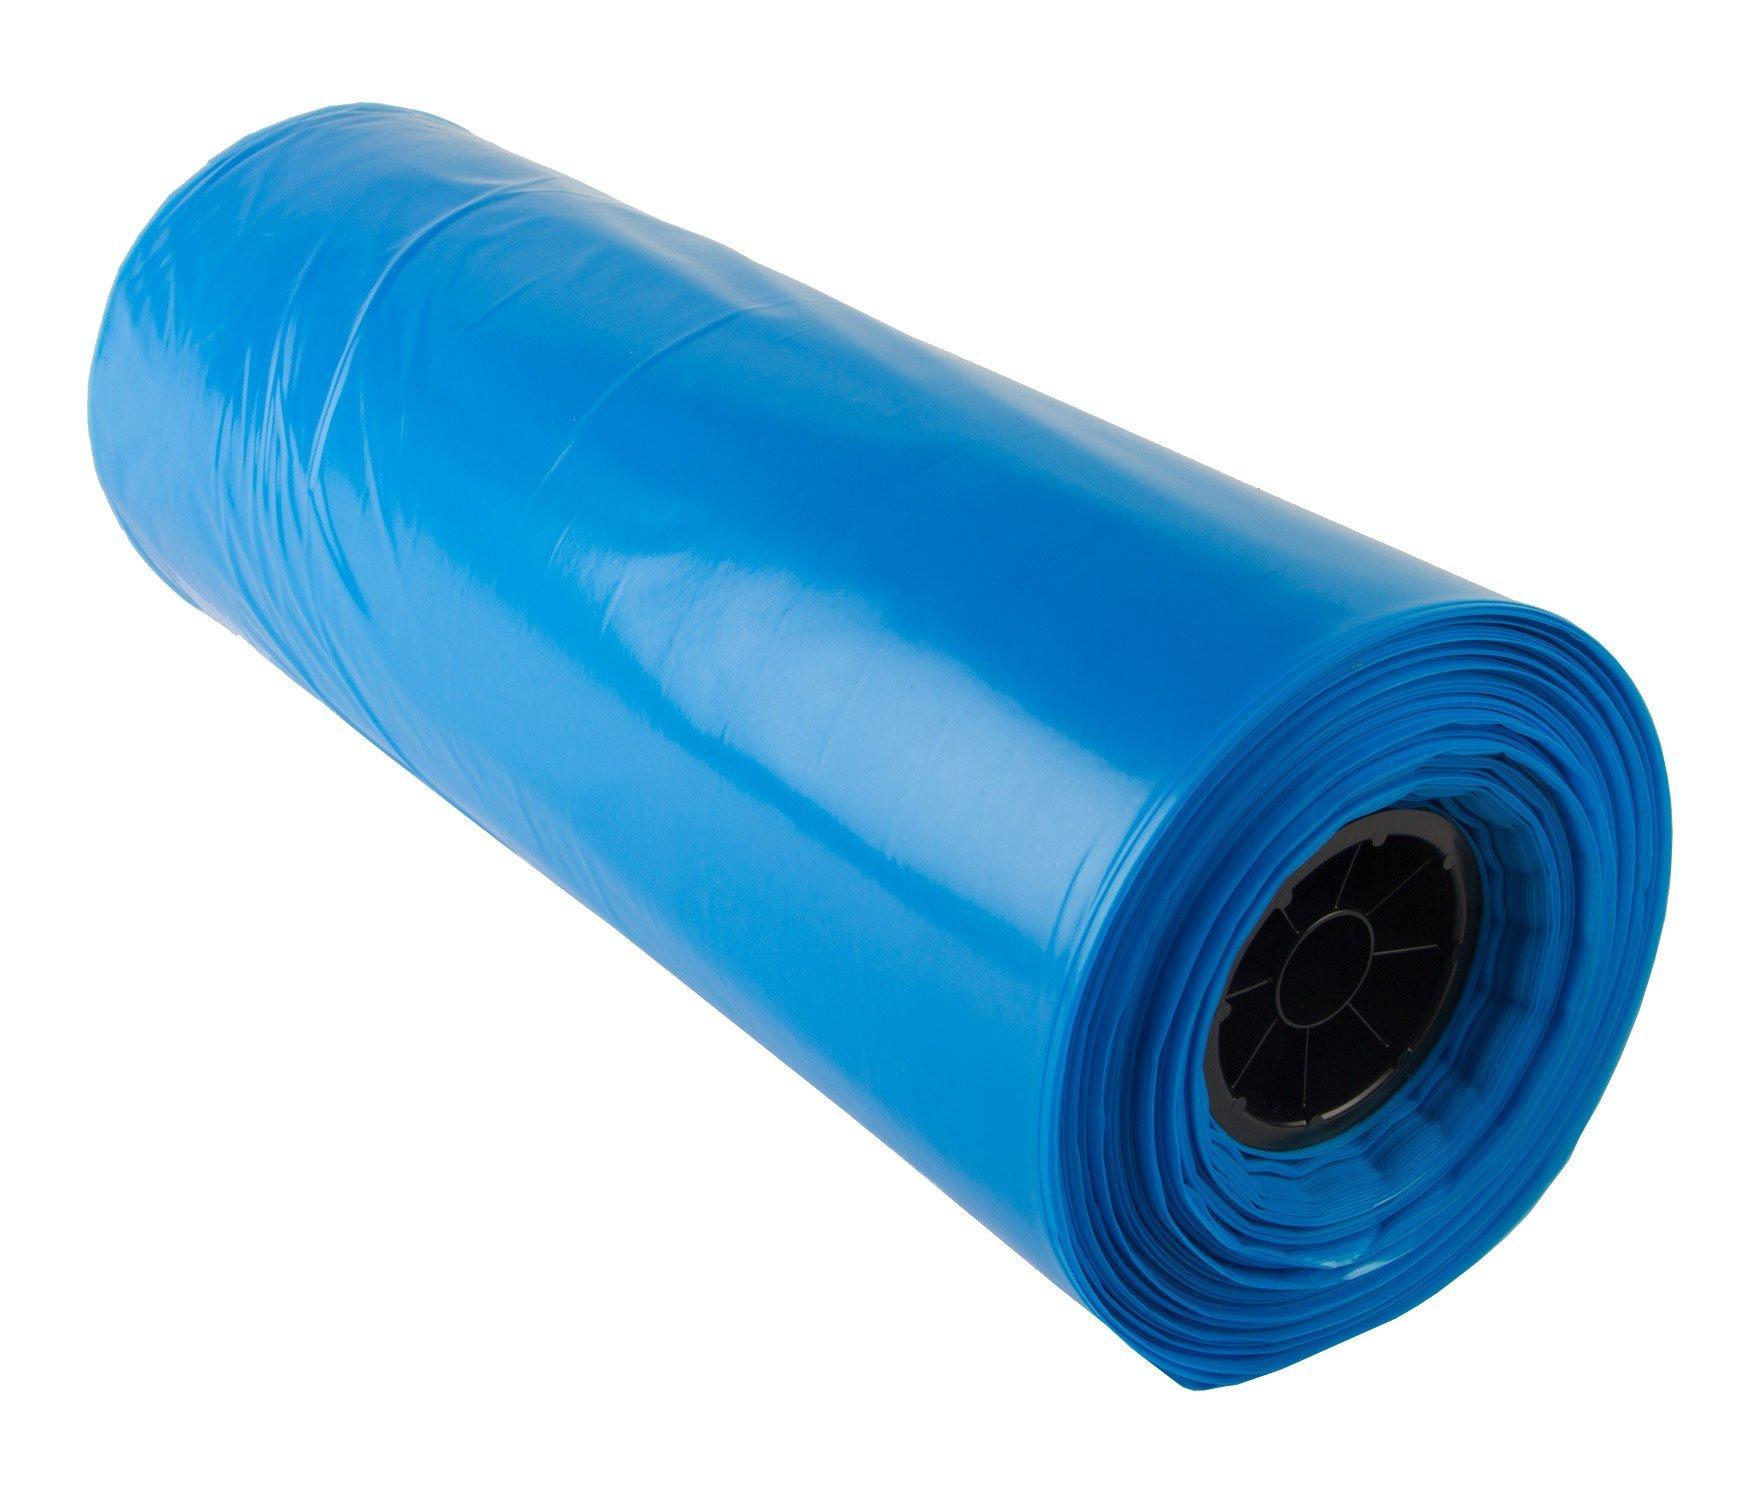 Hudson Exchange LDPE 5 Gallon Bucket Liner, Food Grade, 20'' W x 30'' L, 3 Mil, Blue, Roll of 200